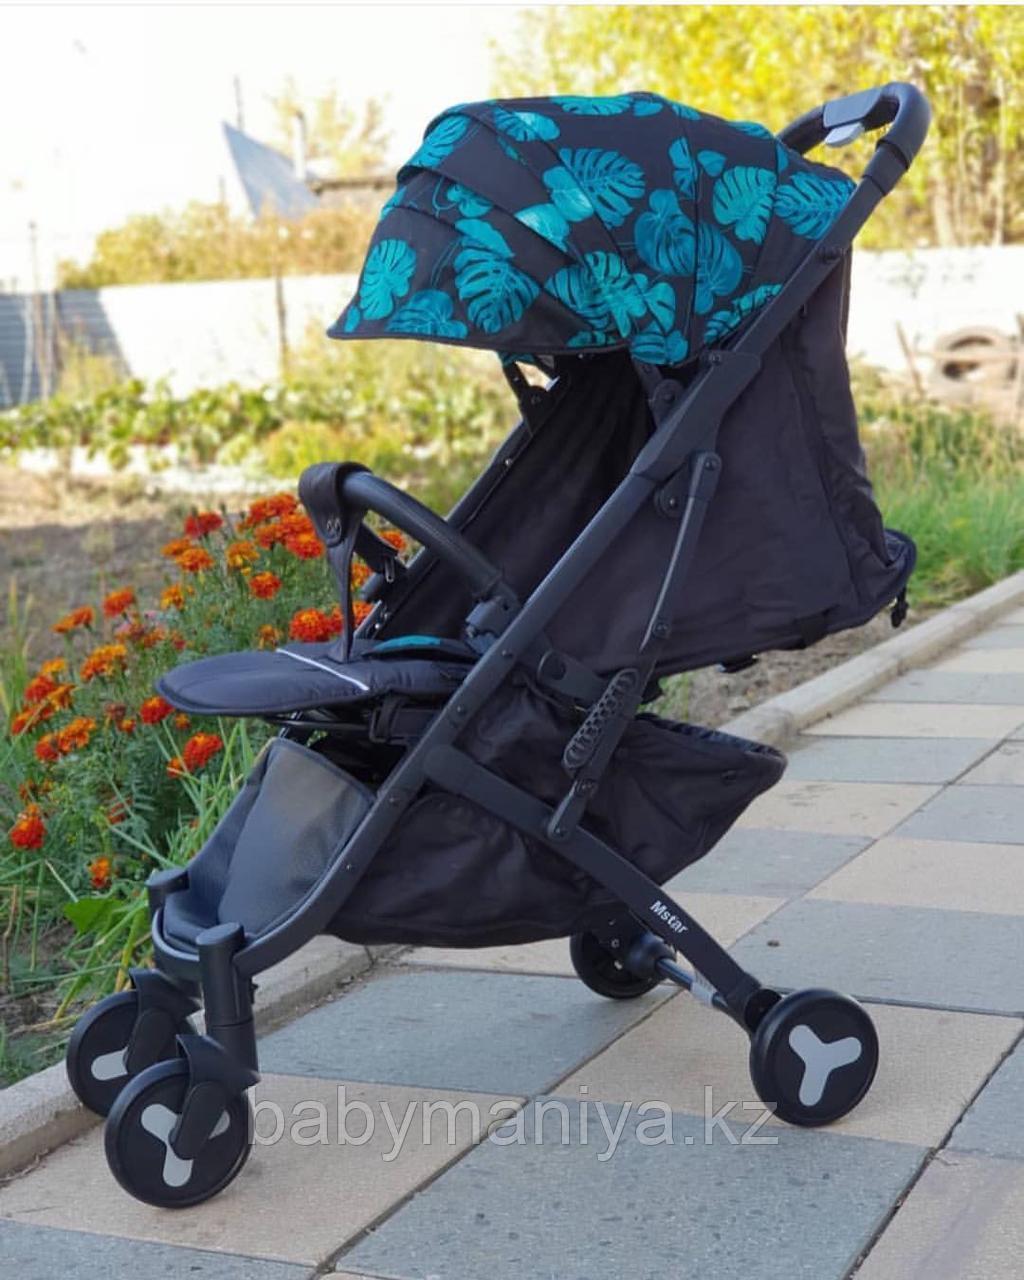 Коляска Mstar (Baby Grace) с чехлом на ножки Лепестки